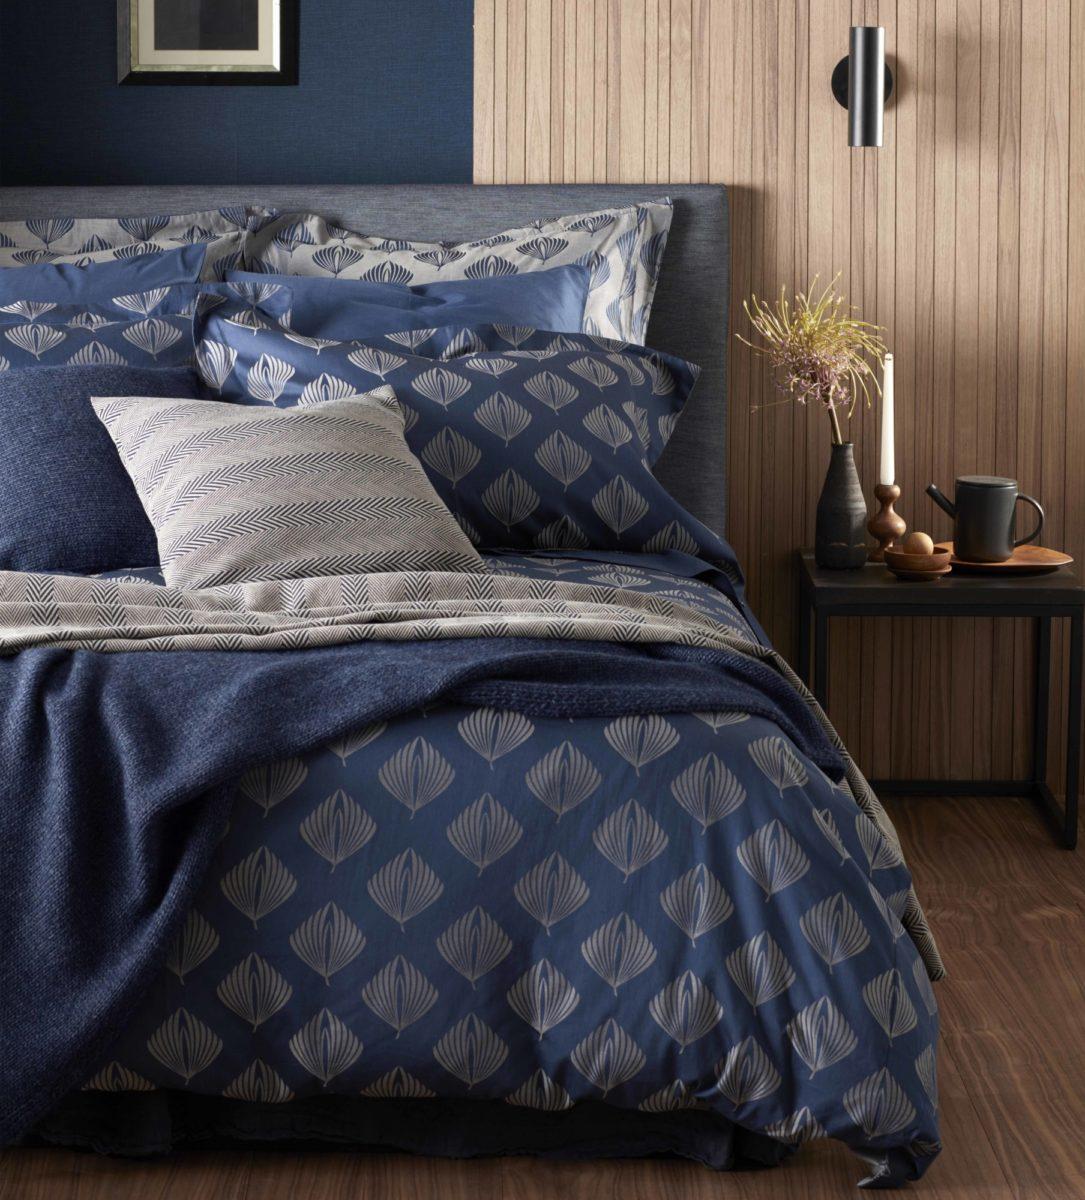 Pinecones Midnight Blue Duvet Covers - 100% Cotton Sateen | Secret…